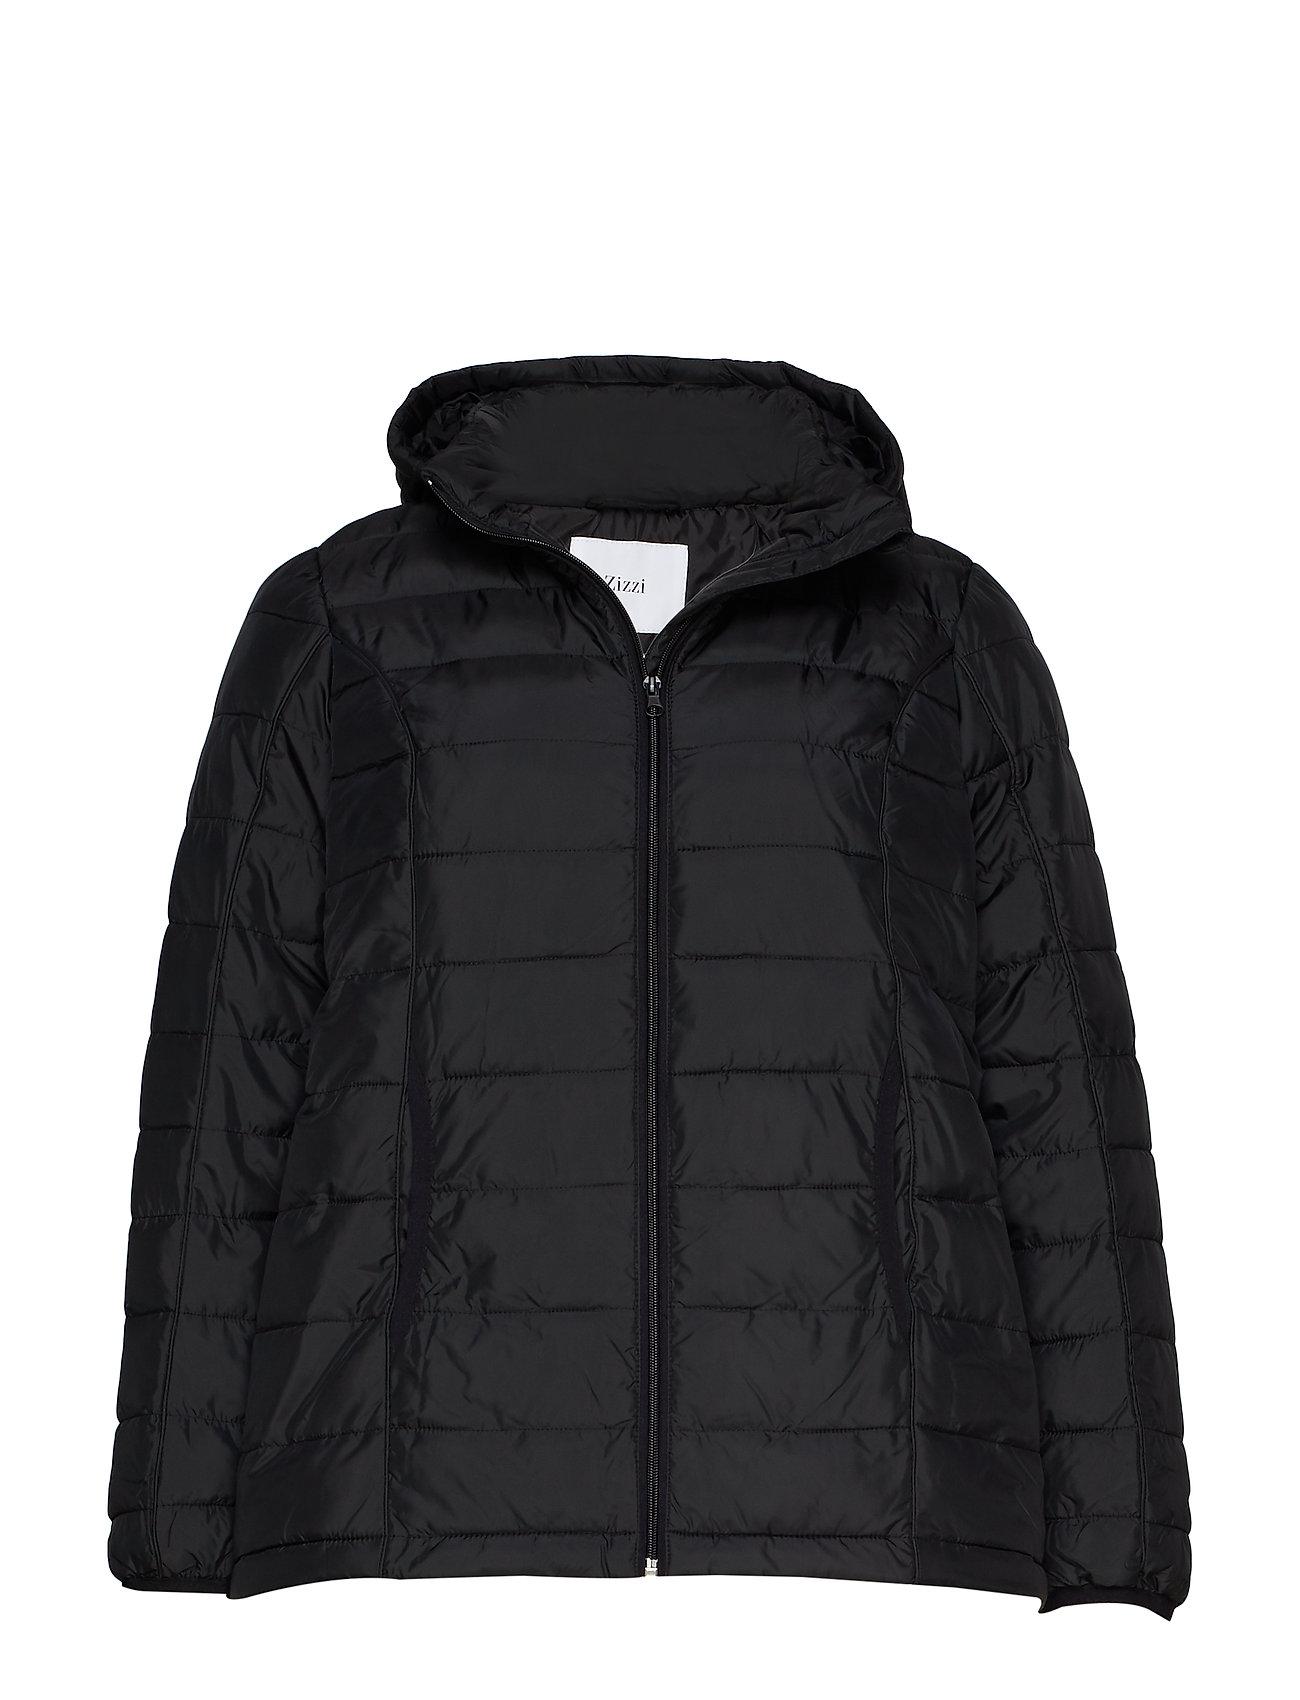 Zizzi Jacket, long sleeve - BLACK